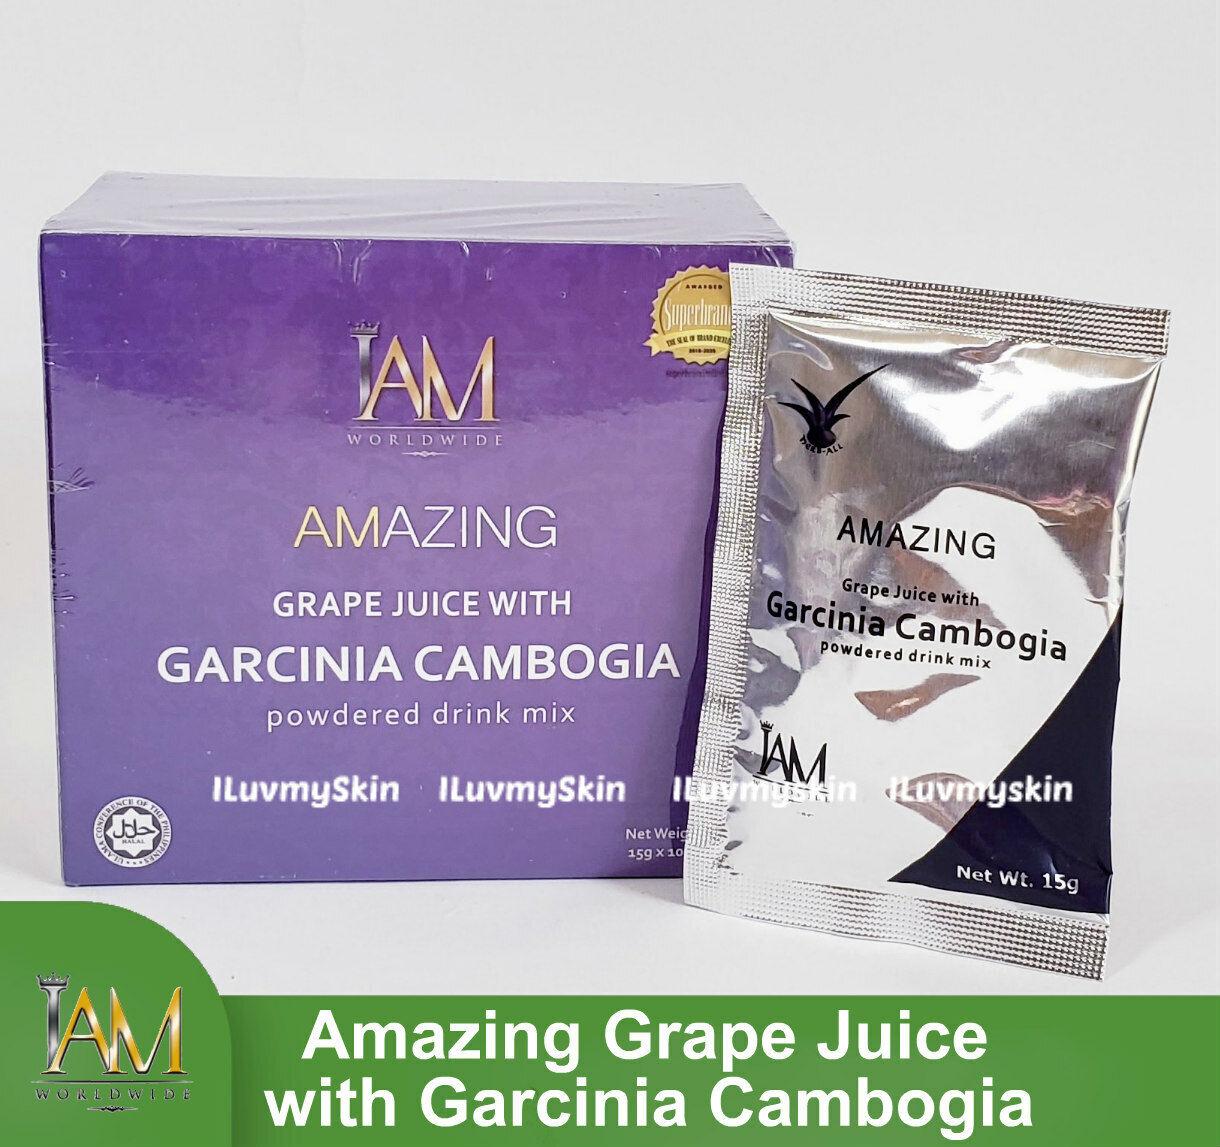 IAM Worldwide Amazing Grape Juice with Garcinia Cambogia 1 box (10 sachets)